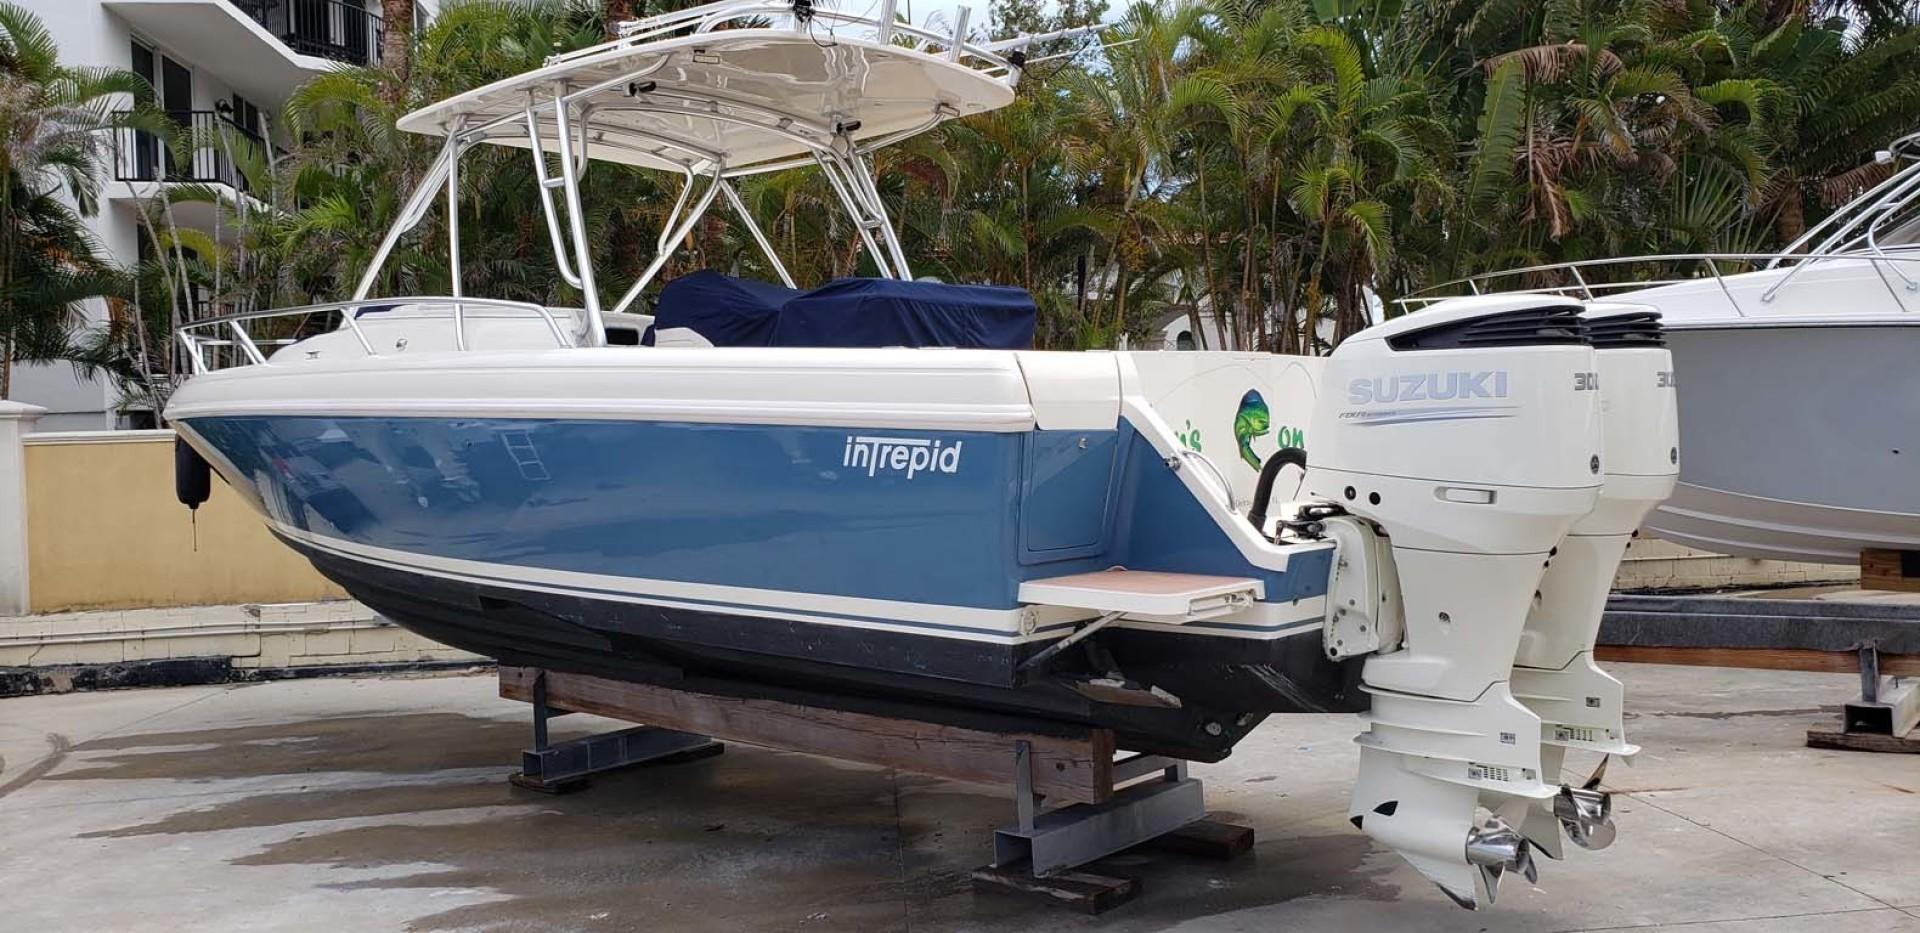 Intrepid-348 Walkaround 2003 -West Palm Beach-Florida-United States-1428858 | Thumbnail